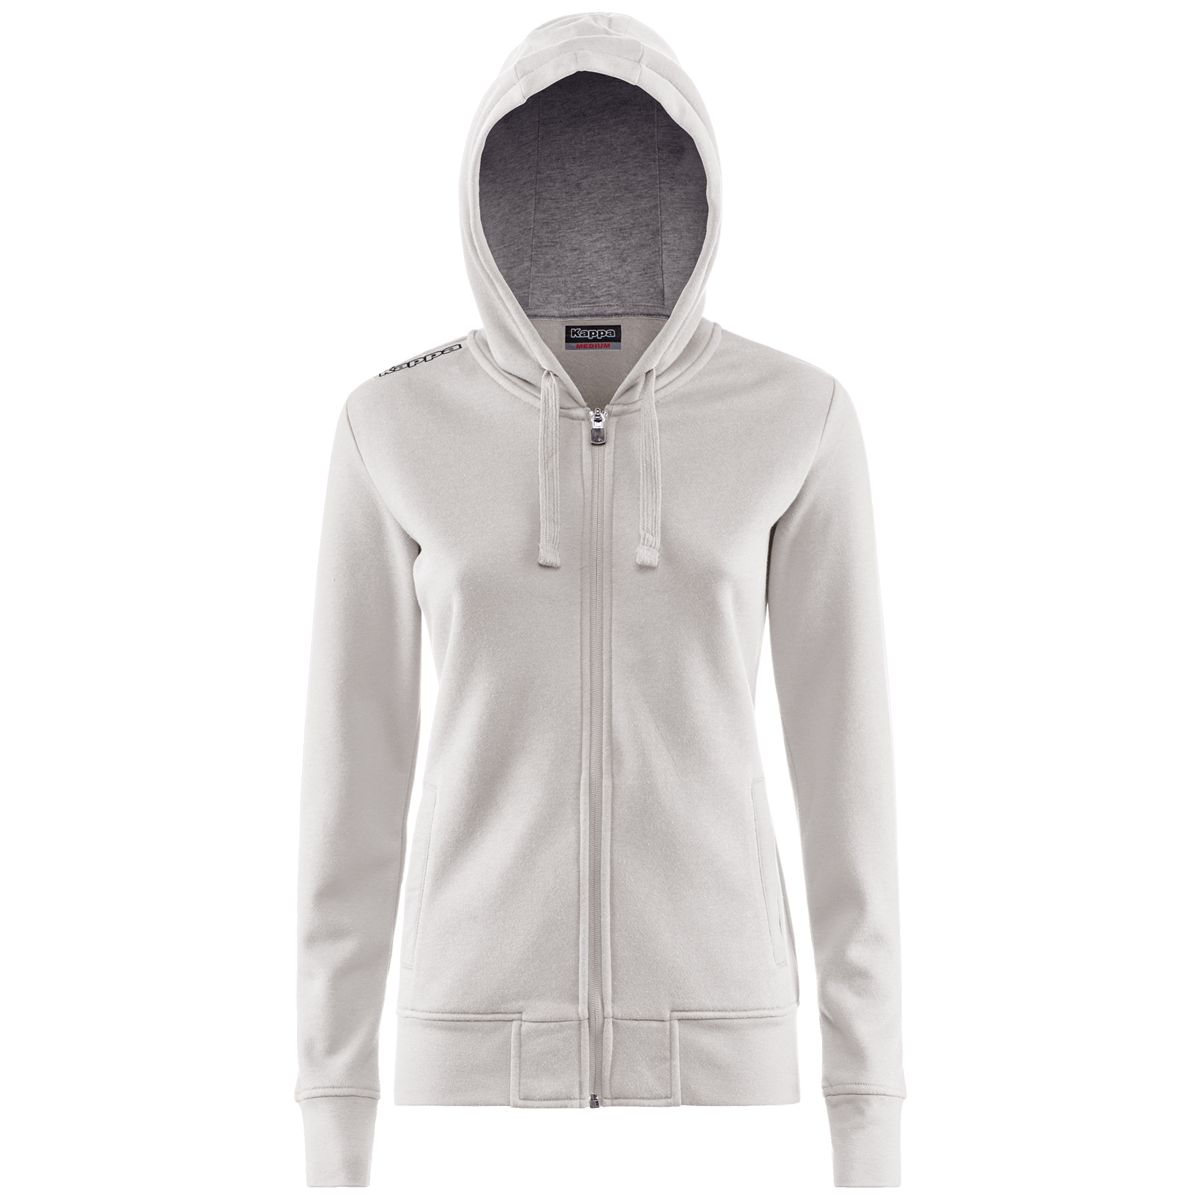 Kappa Fleece Sweater KAPPA4VOLLEY WESON Girl Volley sport Jacket